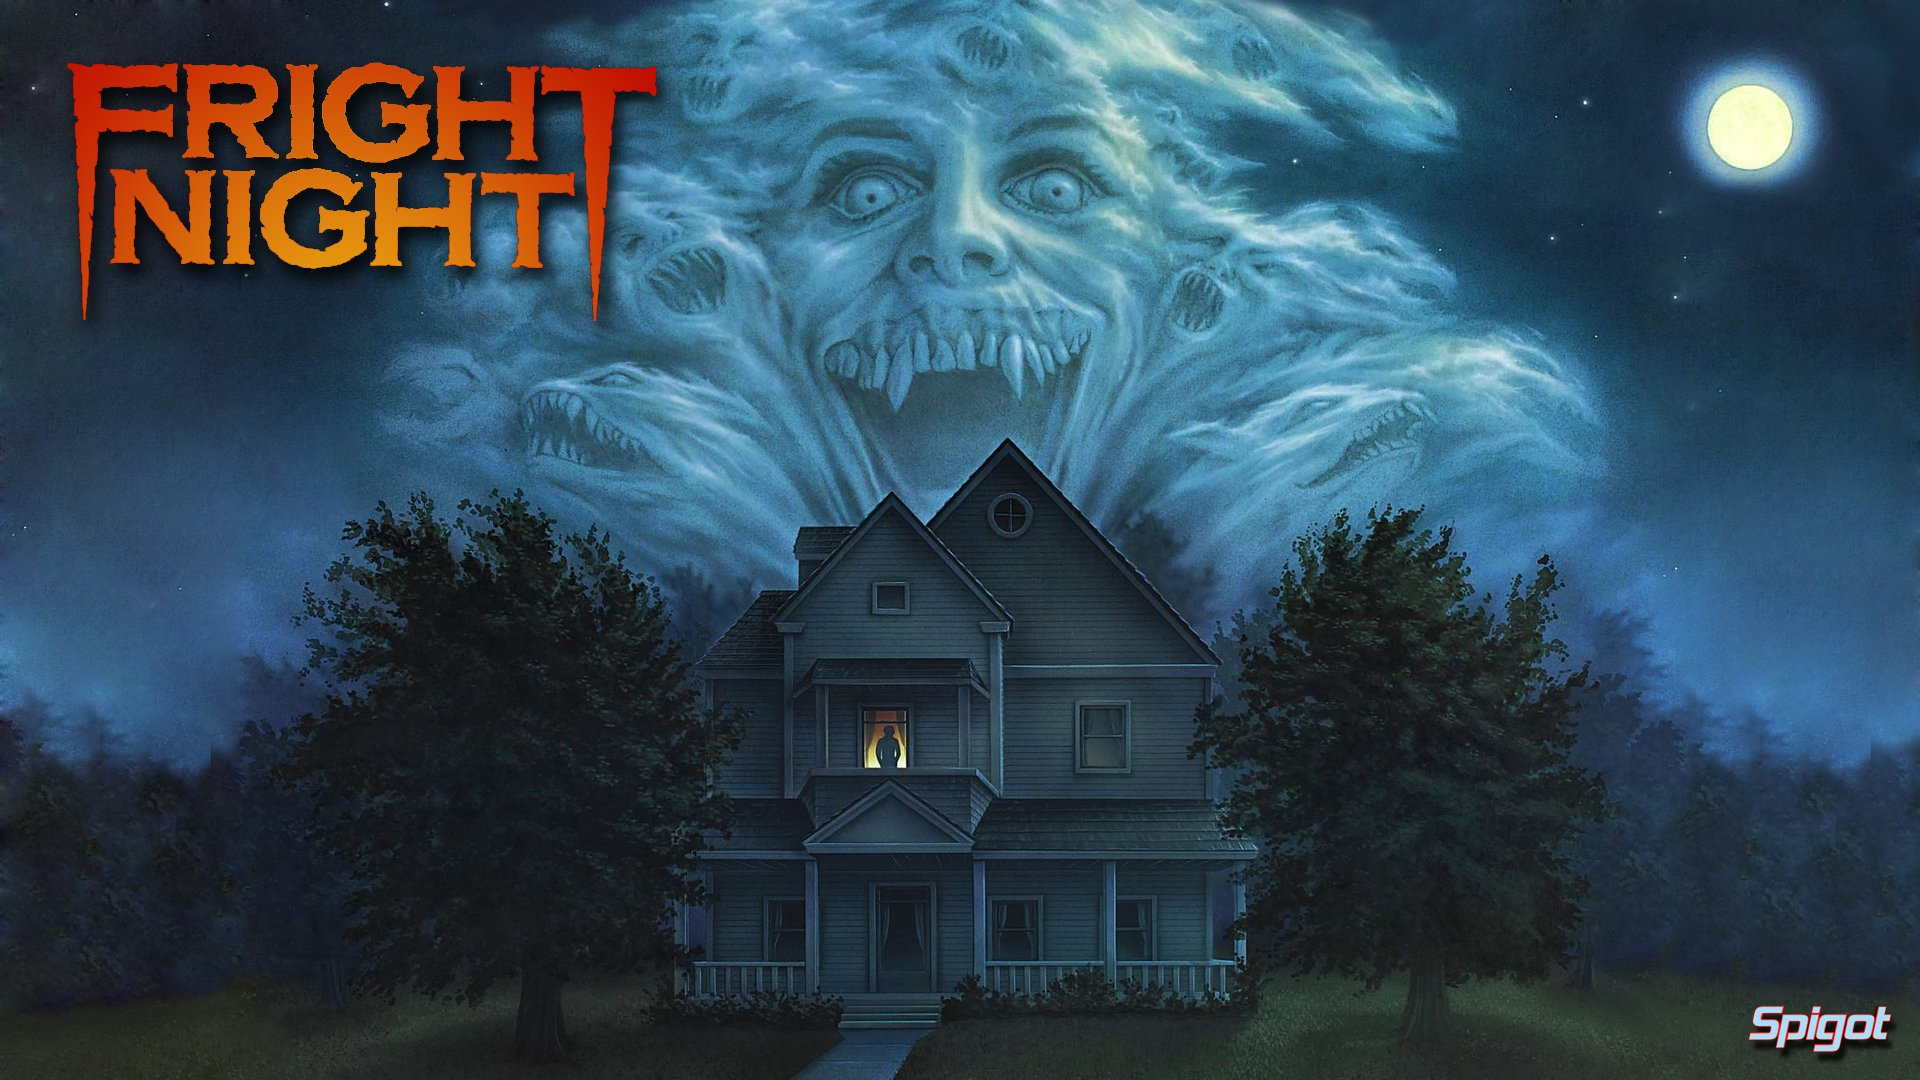 FRIGHT NIGHT comedy horror dark movie film halloween ...